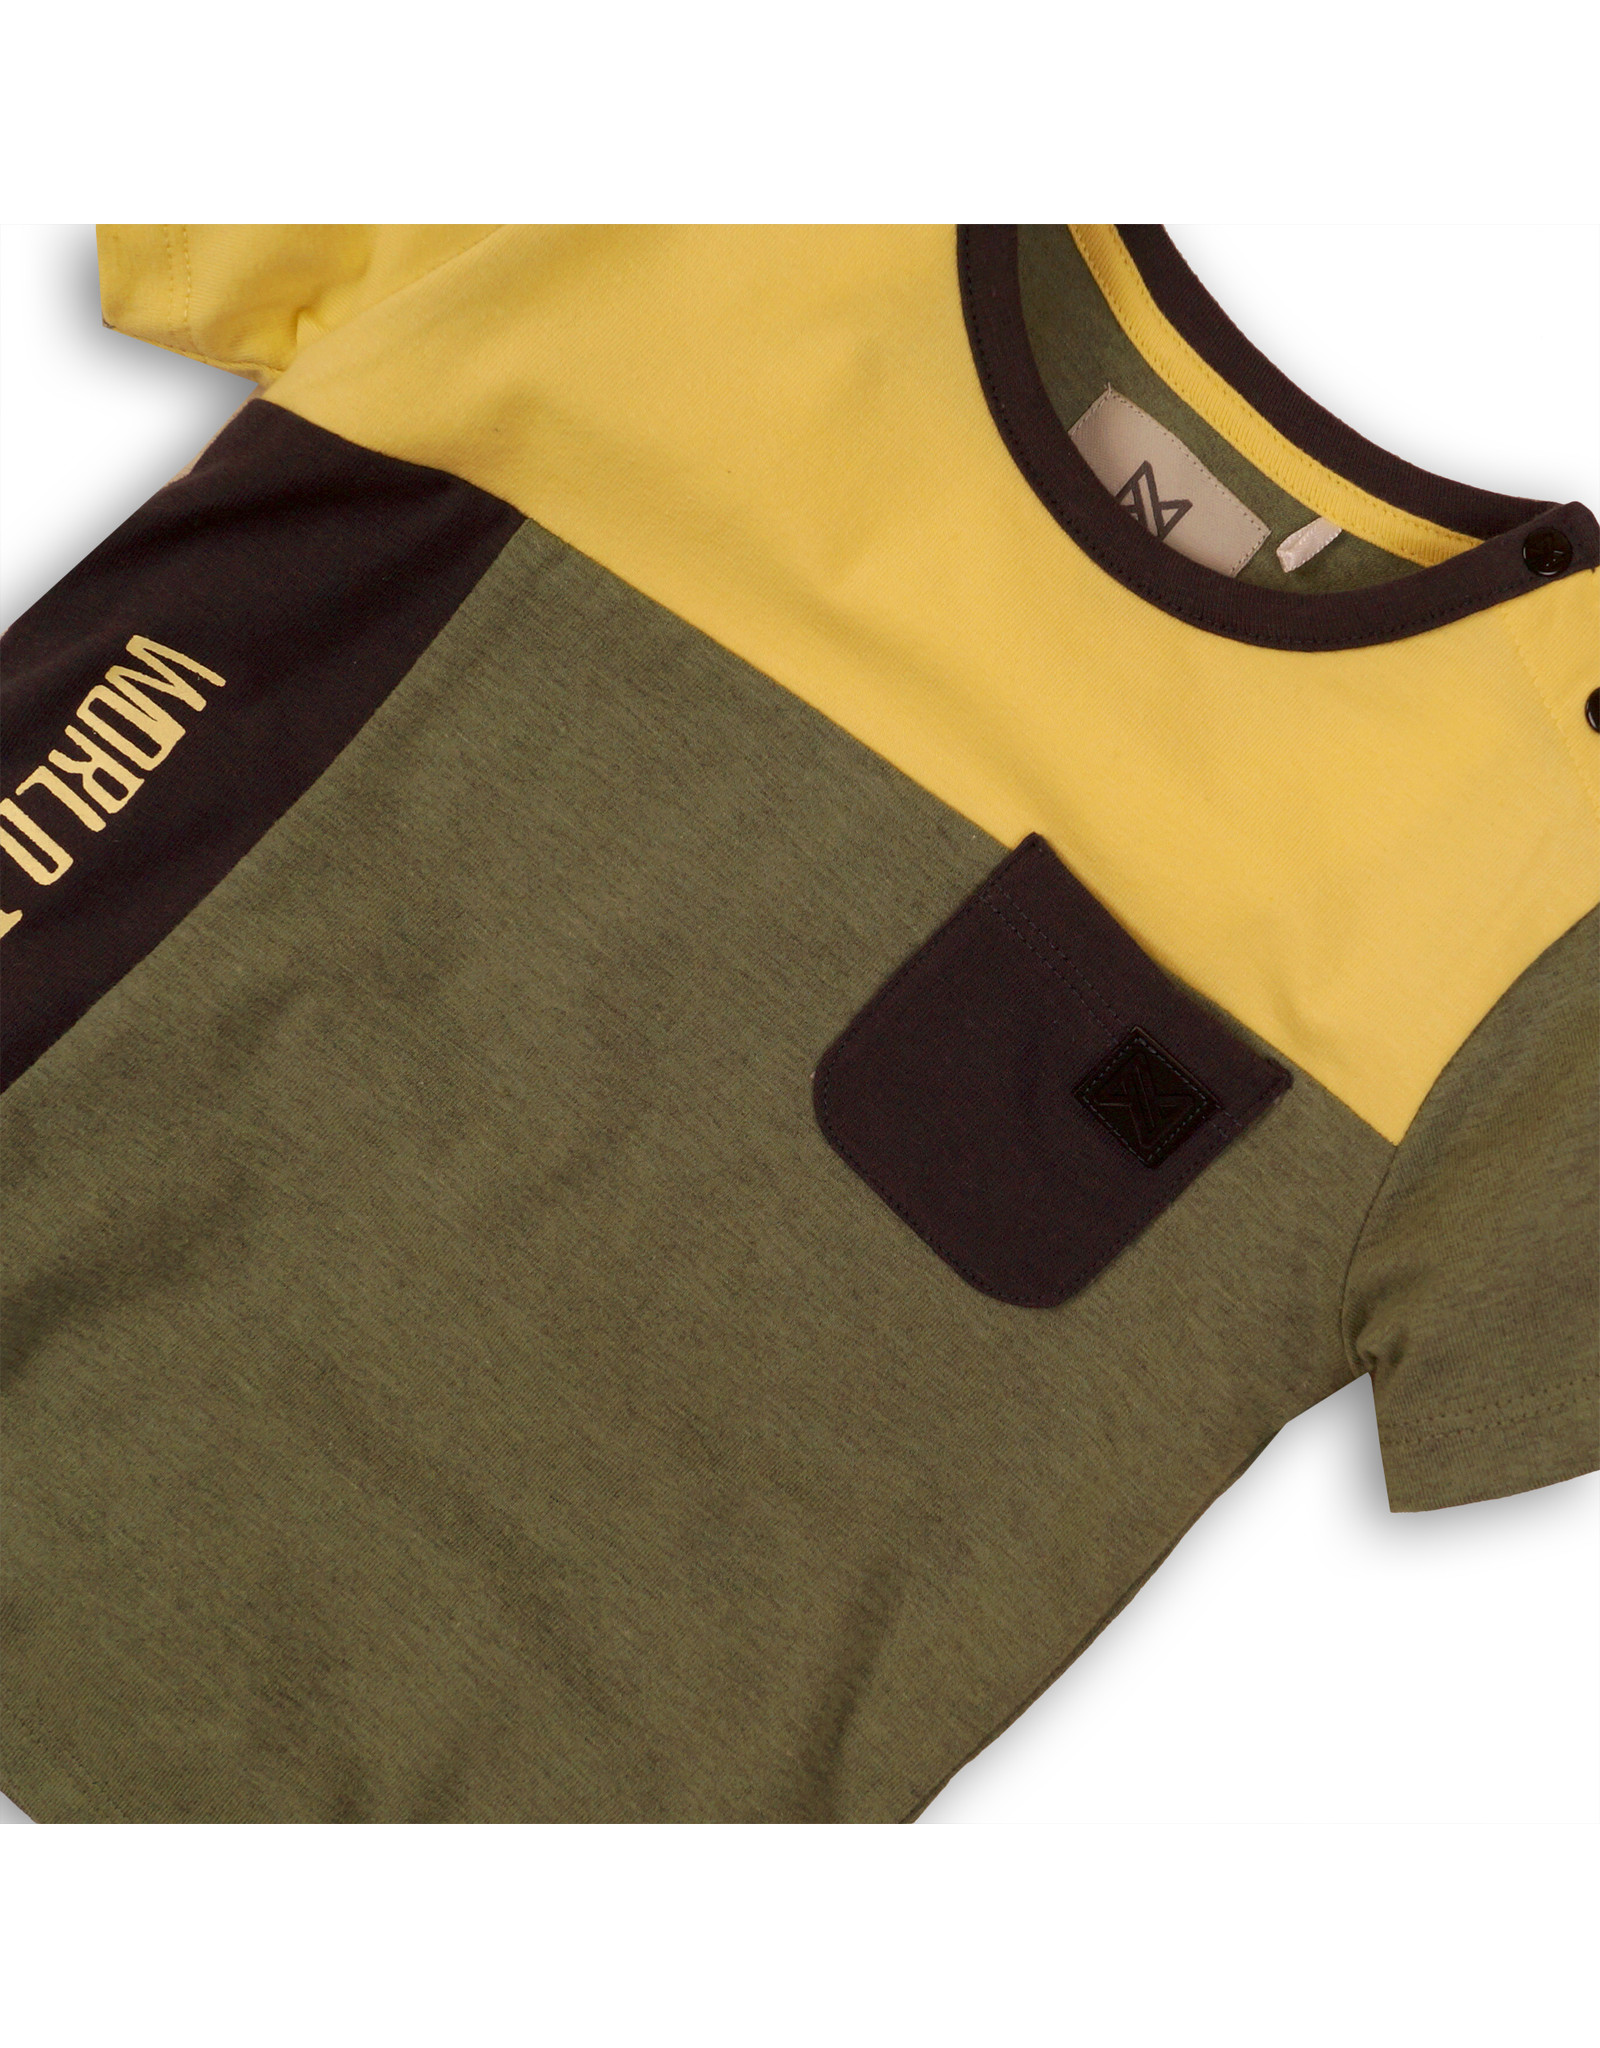 Koko Noko T-shirt colors